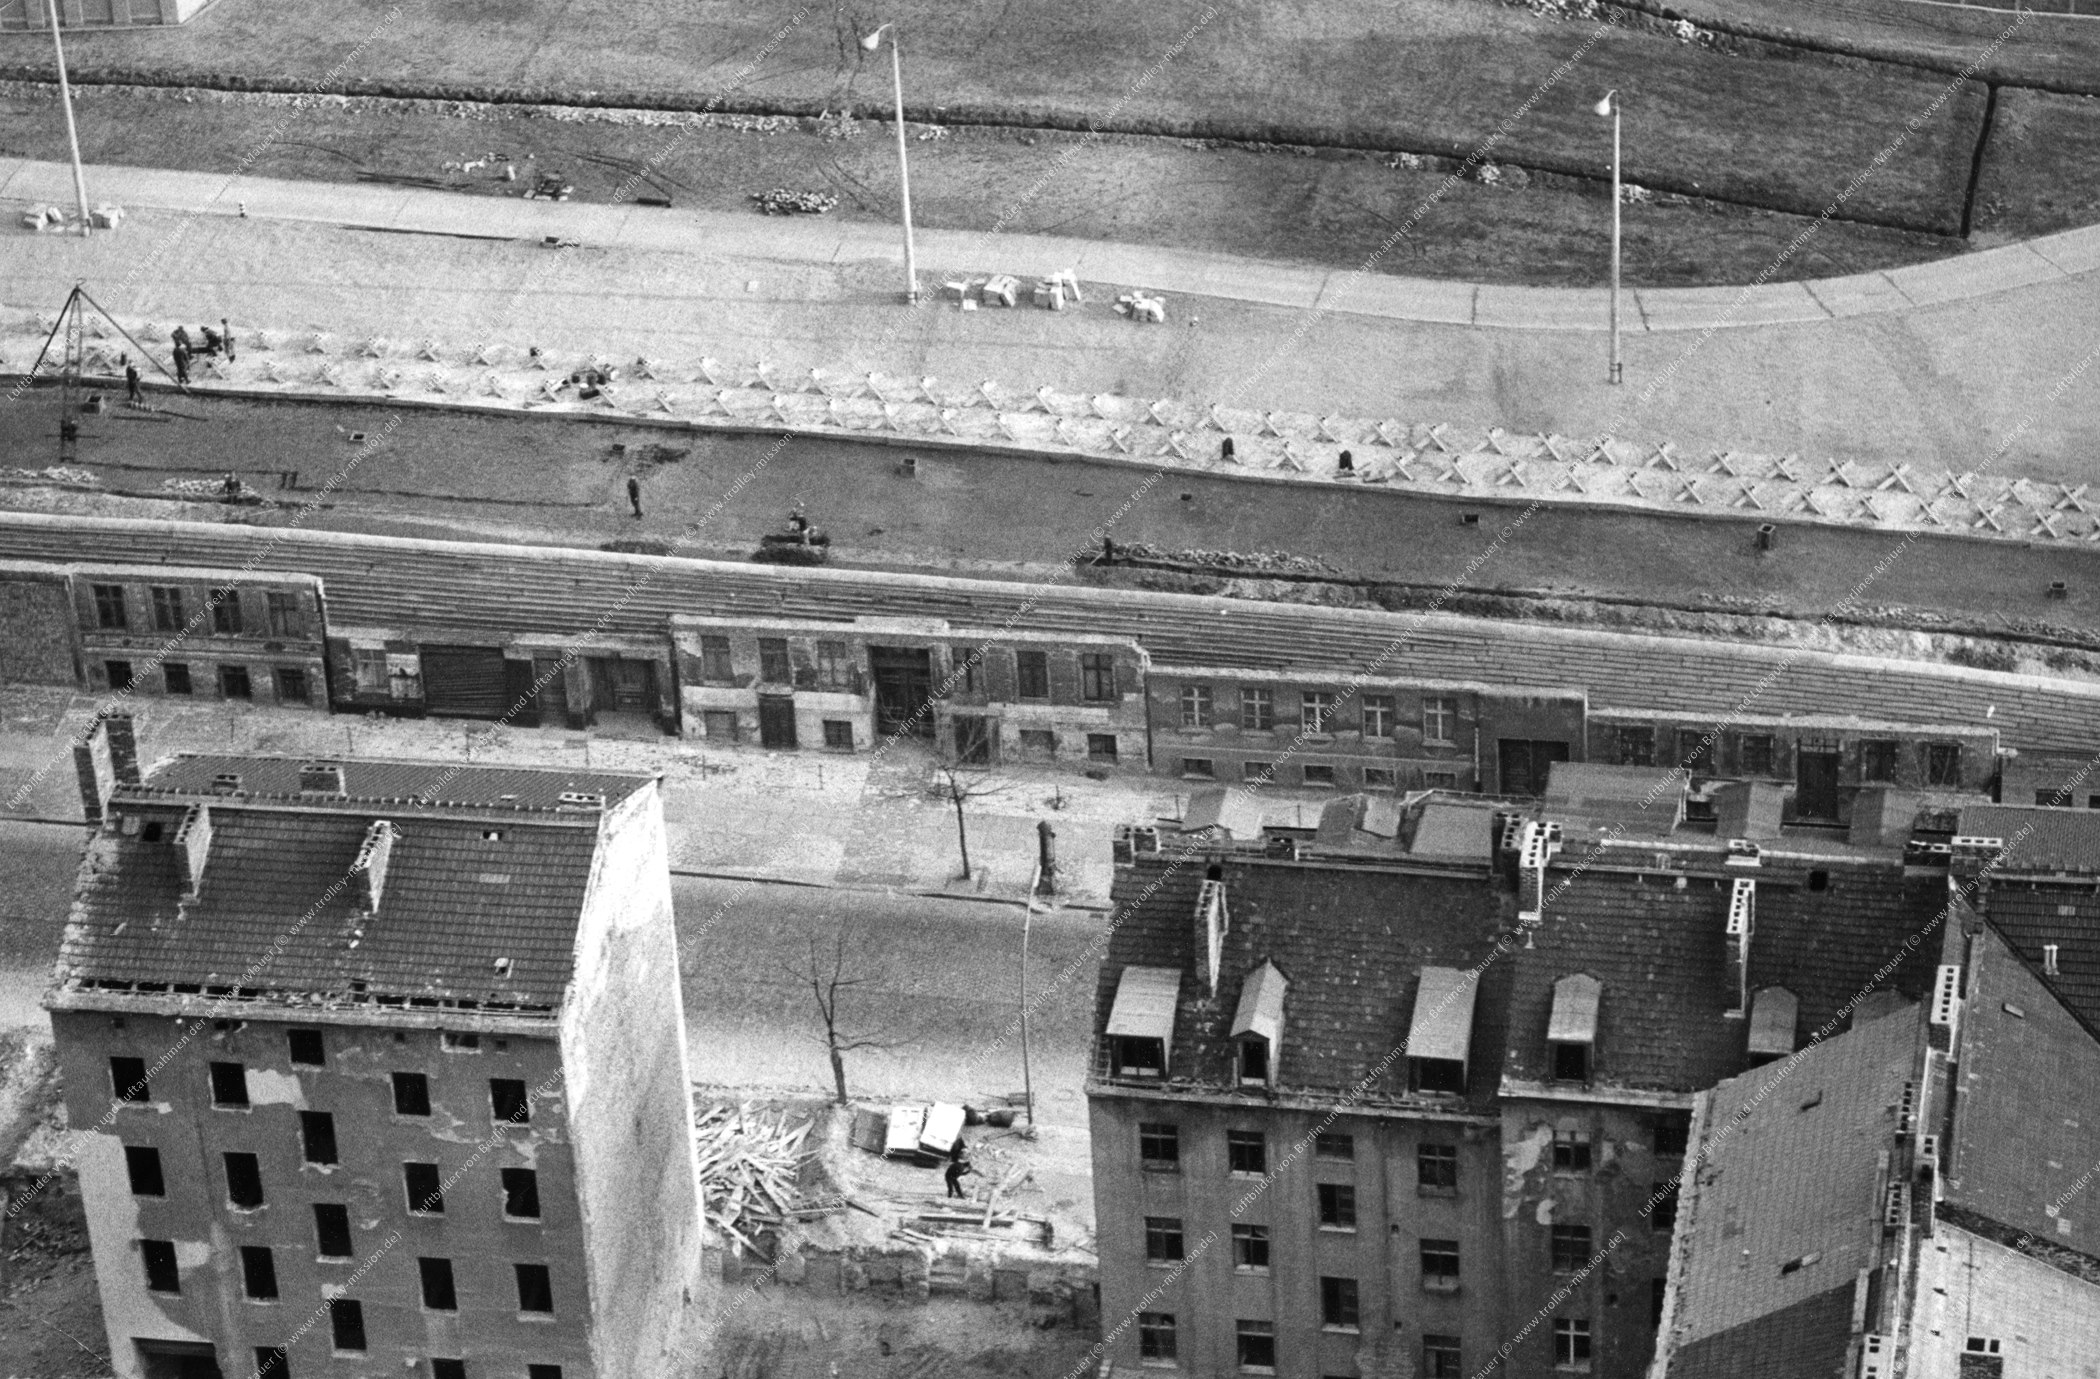 Berlin Luftbild Bernauer Straße vom 6. November 1967 (Bild 045)